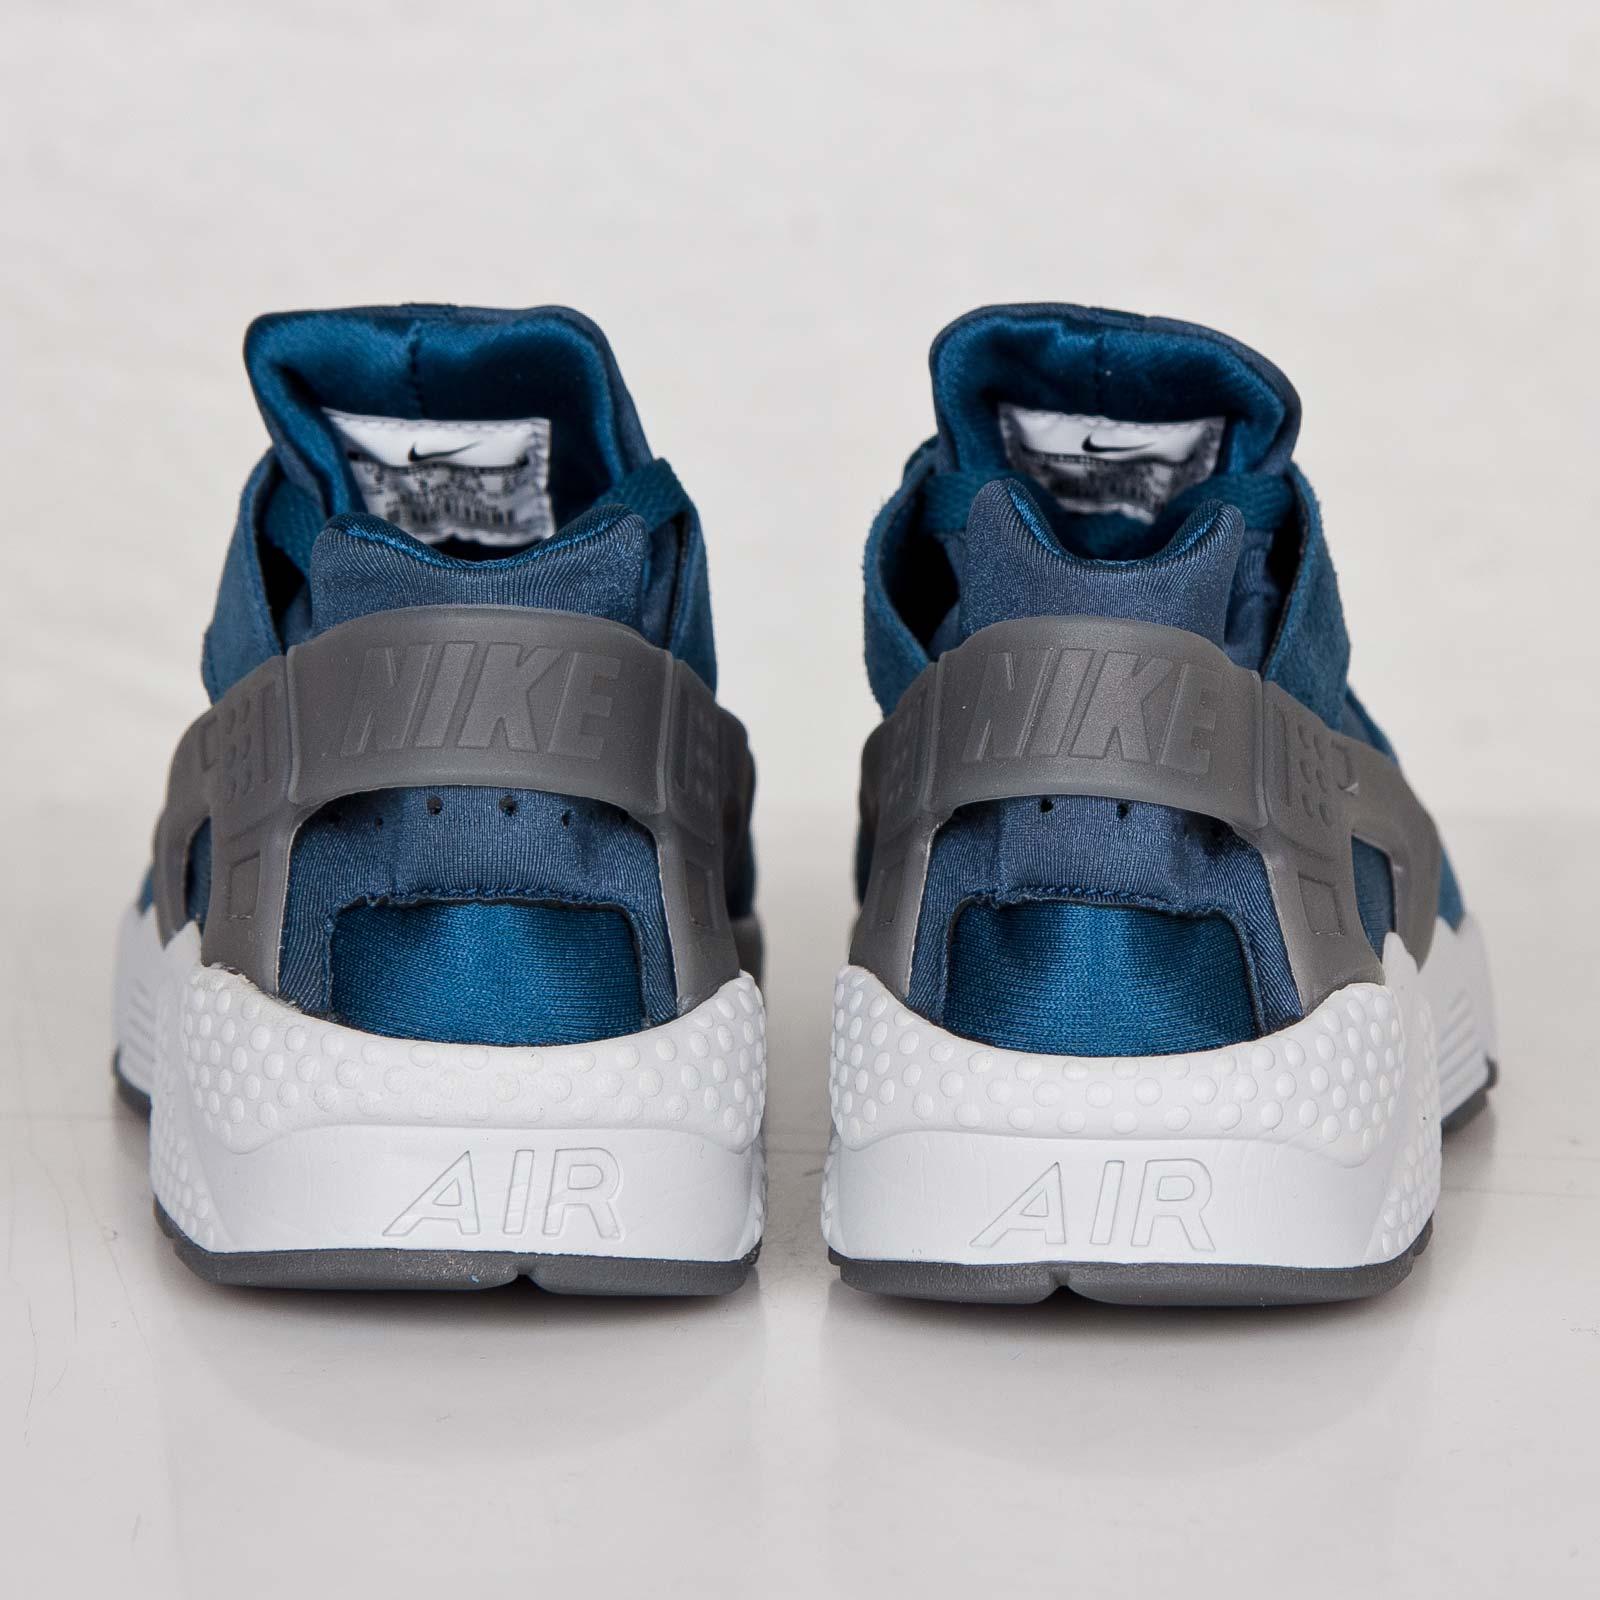 hot sale online dfca5 5ecc8 Nike Air Huarache - 318429-403 - Sneakersnstuff   sneakers   streetwear  online since 1999